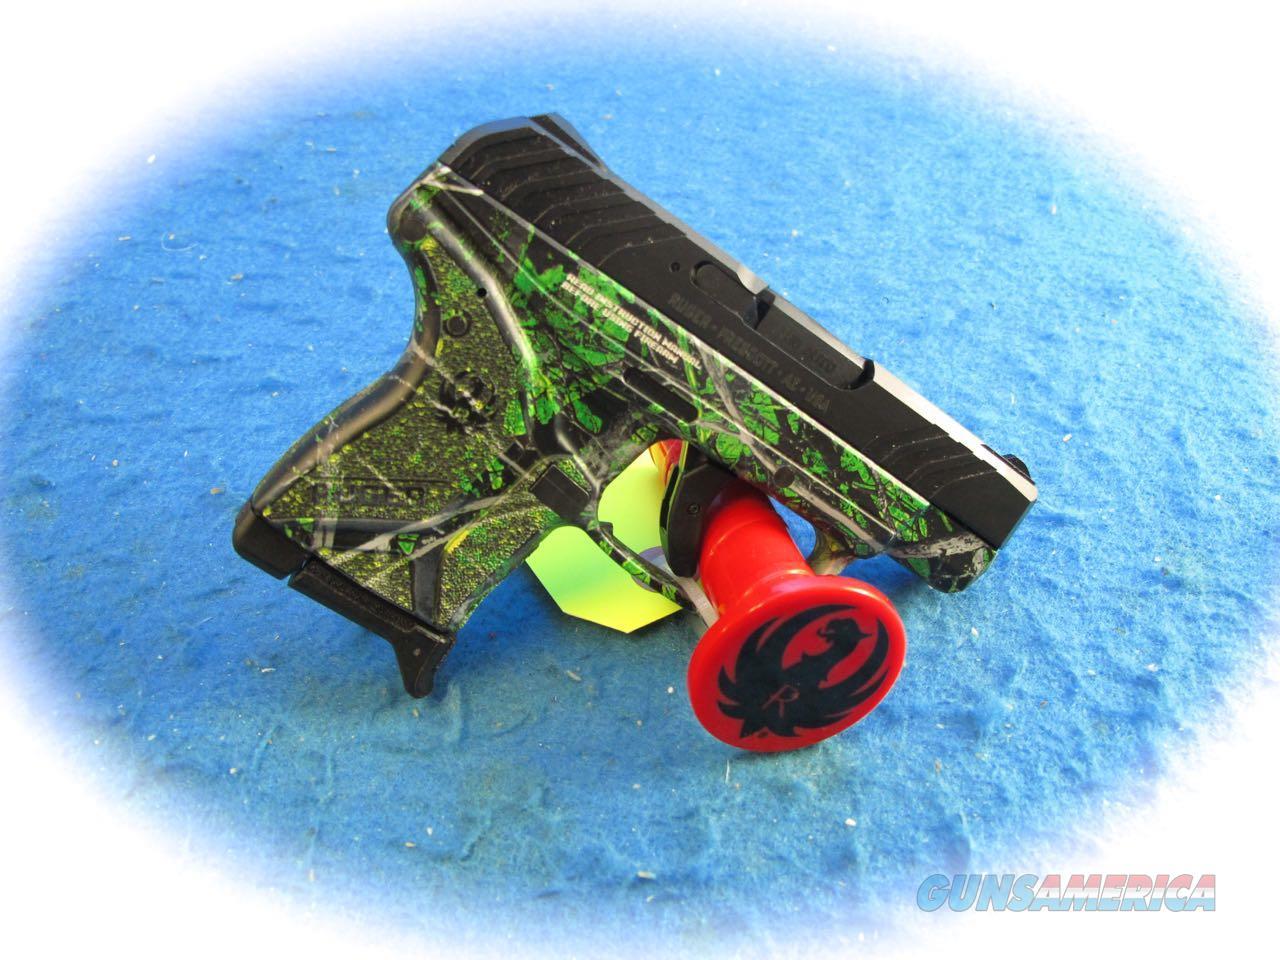 Ruger LCP II .380 ACP Pistol  Moonshine Toxic Camo Model 3765 **New**   Guns > Pistols > Ruger Semi-Auto Pistols > LCP